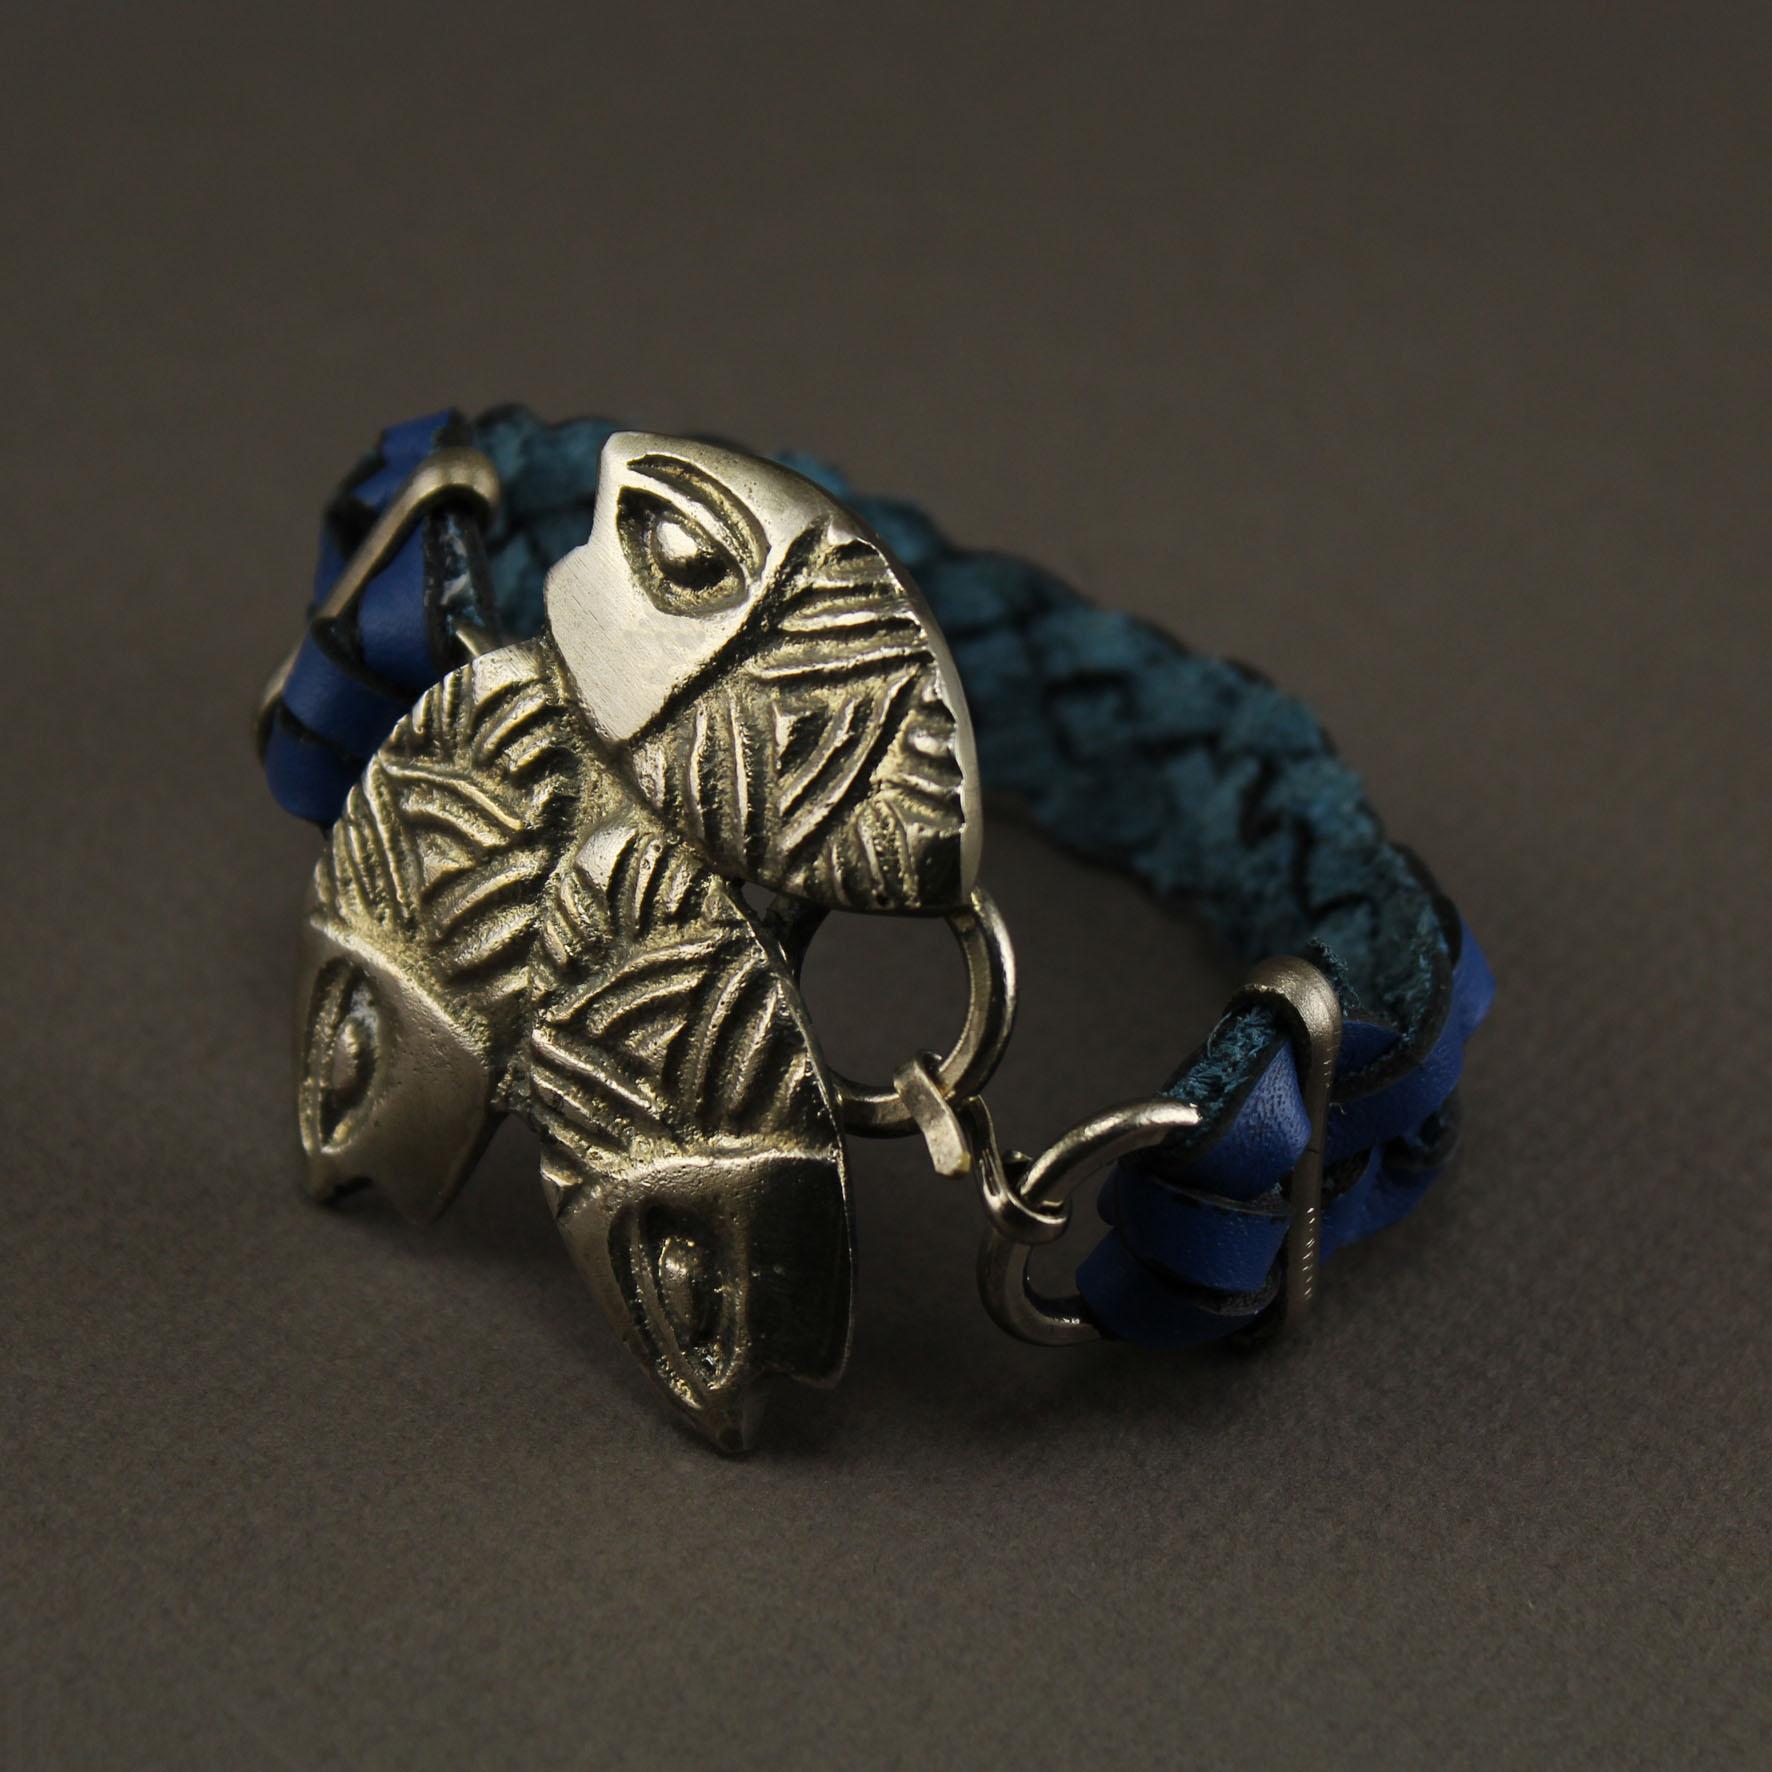 Fish Swarm Bracelet